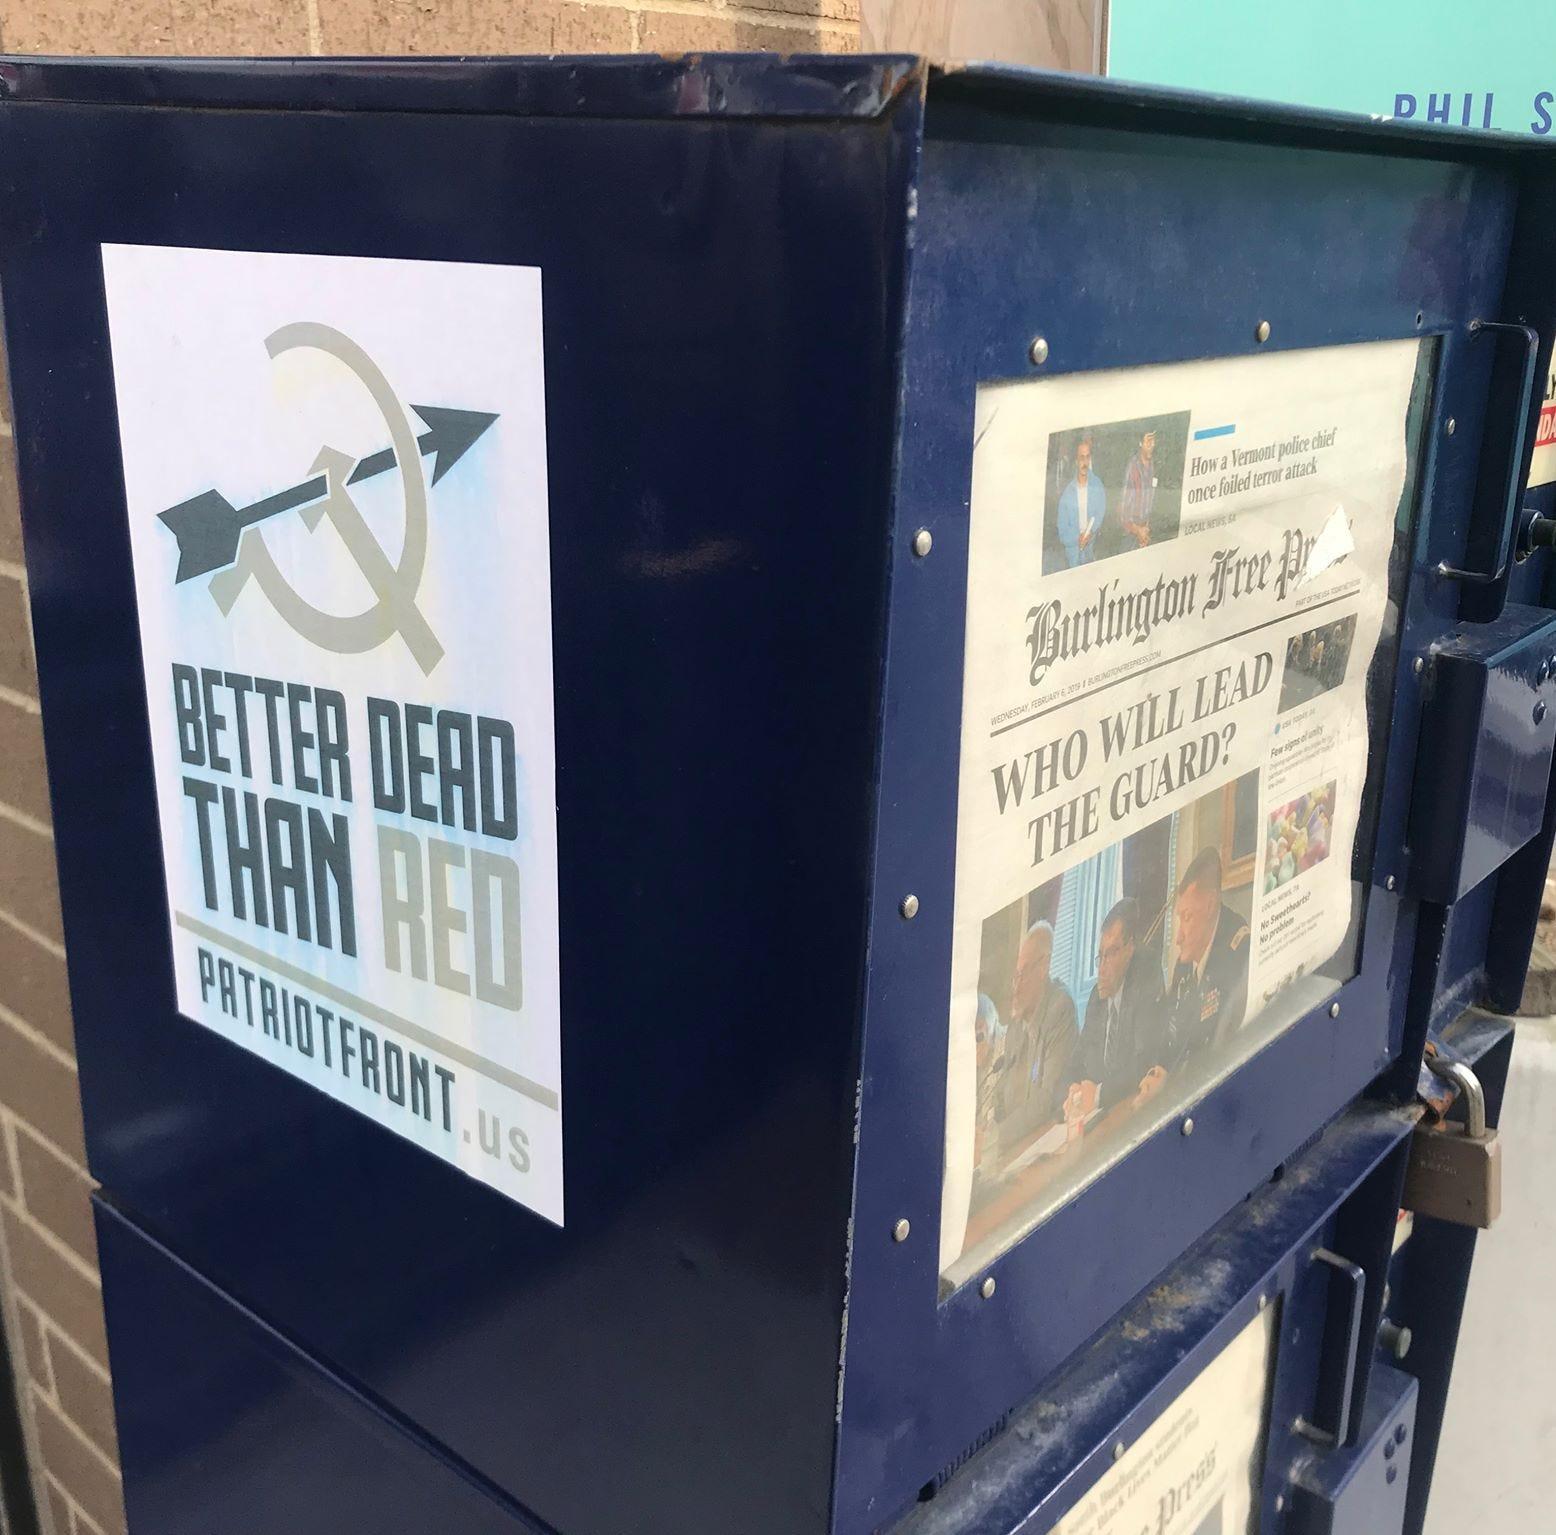 Police, prosecutor find 'no crime' after investigating Patriot Front posters in Burlington